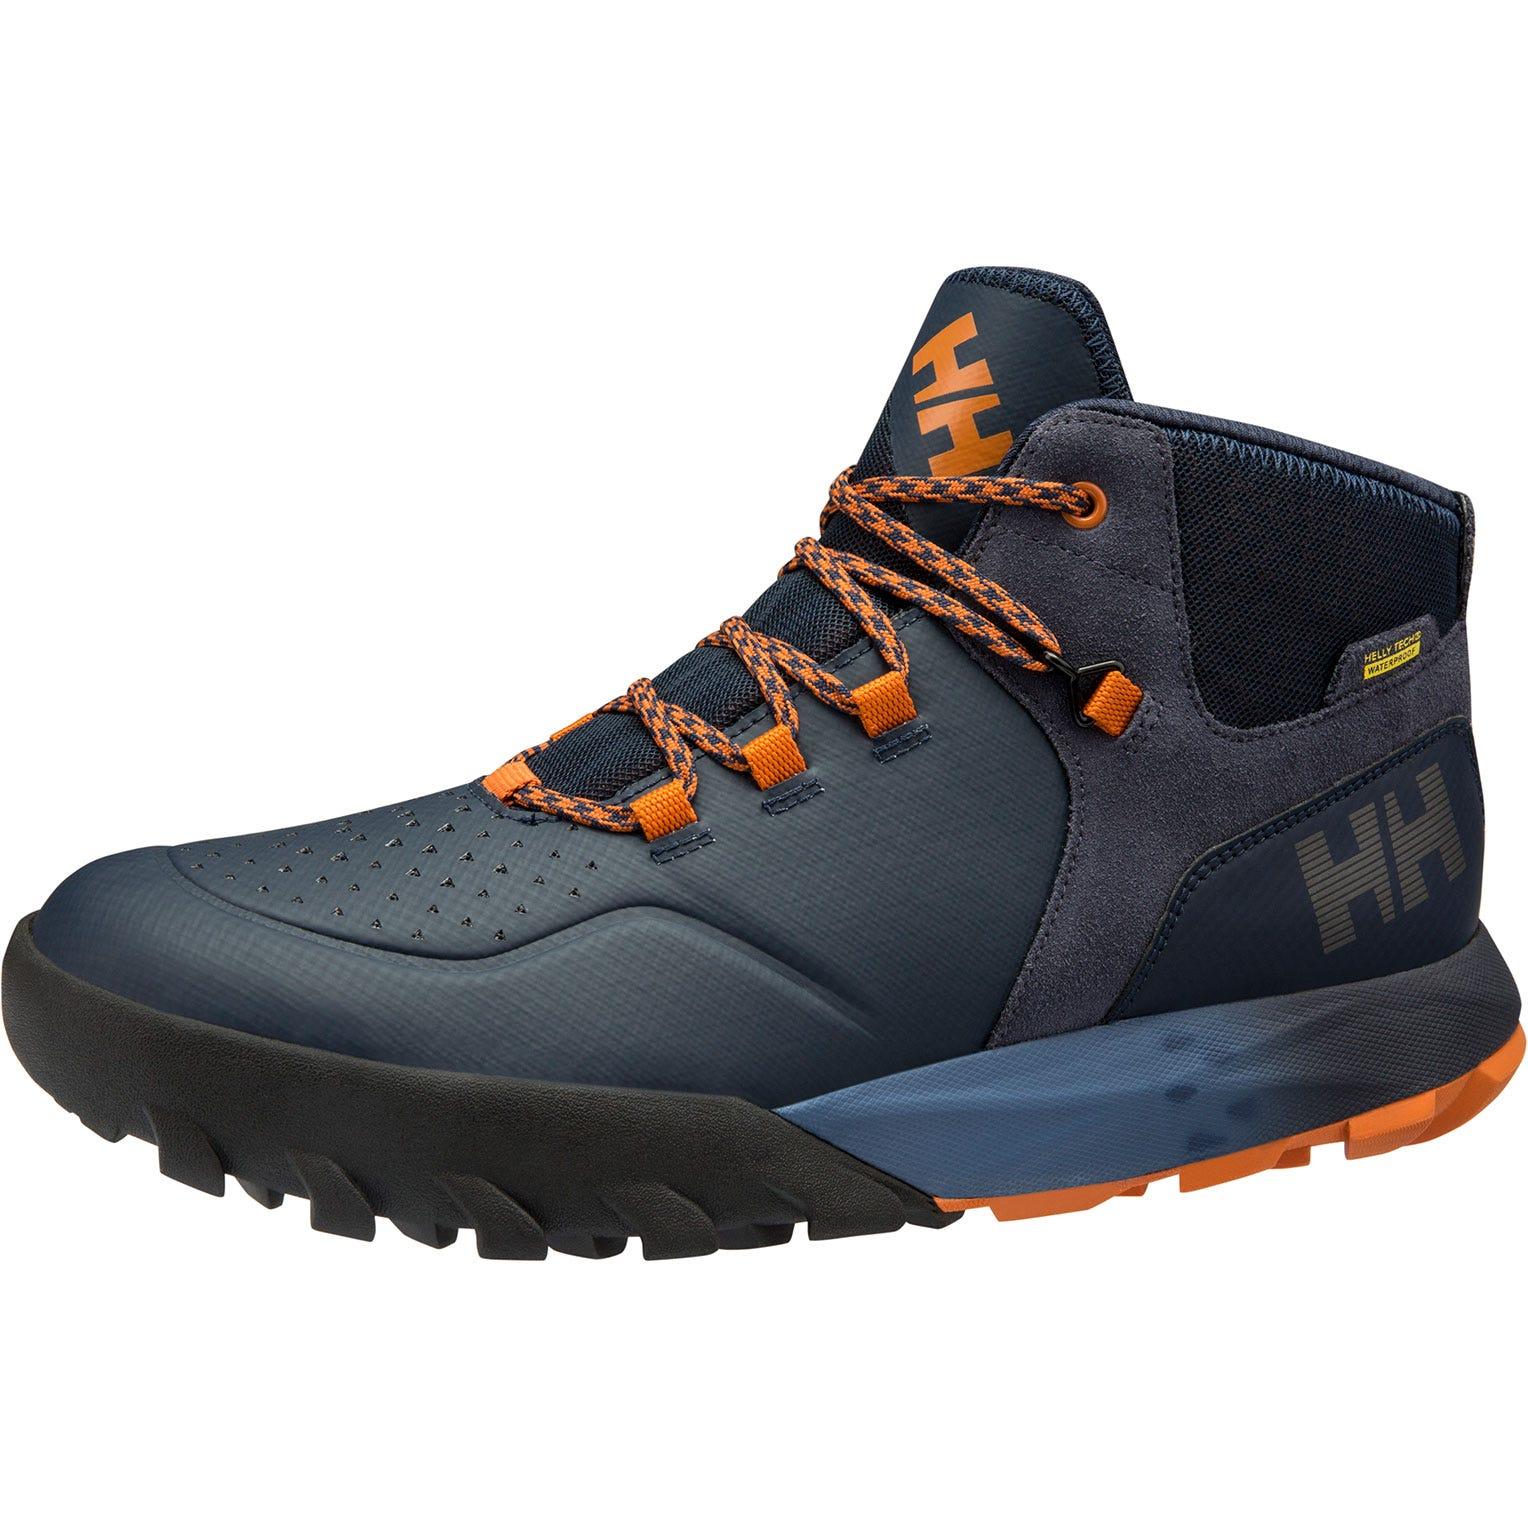 Helly Hansen Loke Rambler Ht Mens Hiking Boot Navy 46/11.5